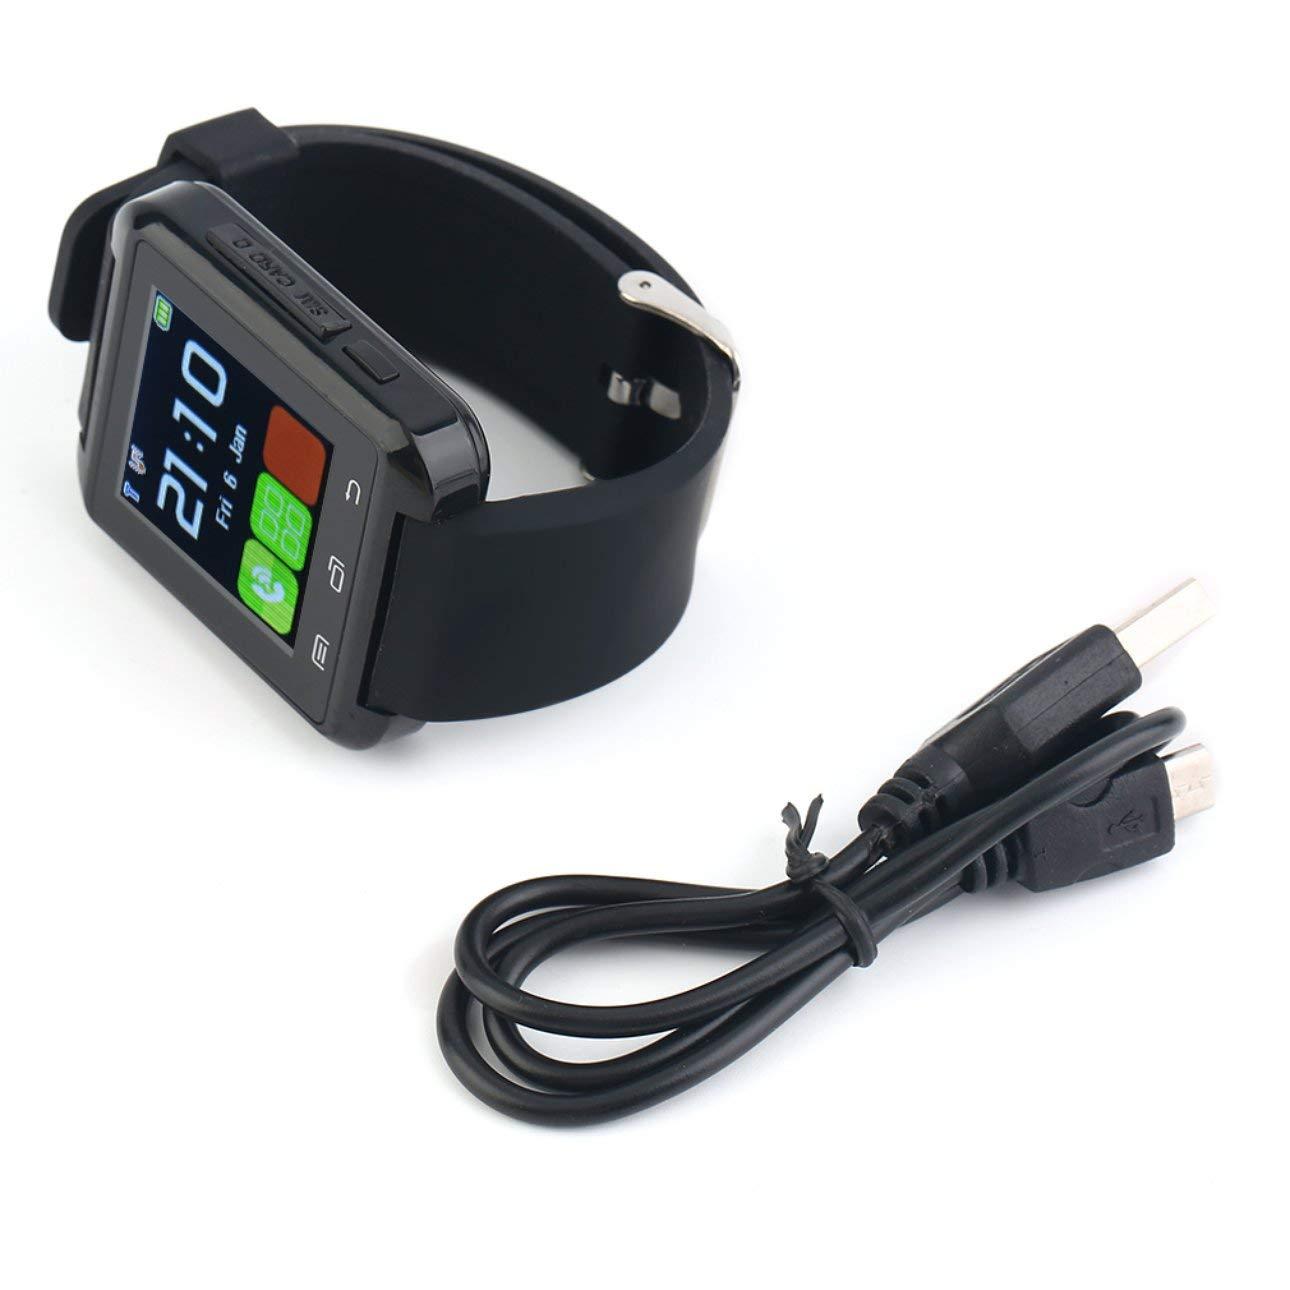 Amazon.com: Liobaba Bluetooth SmartWatch GSM SIM Card Slot ...